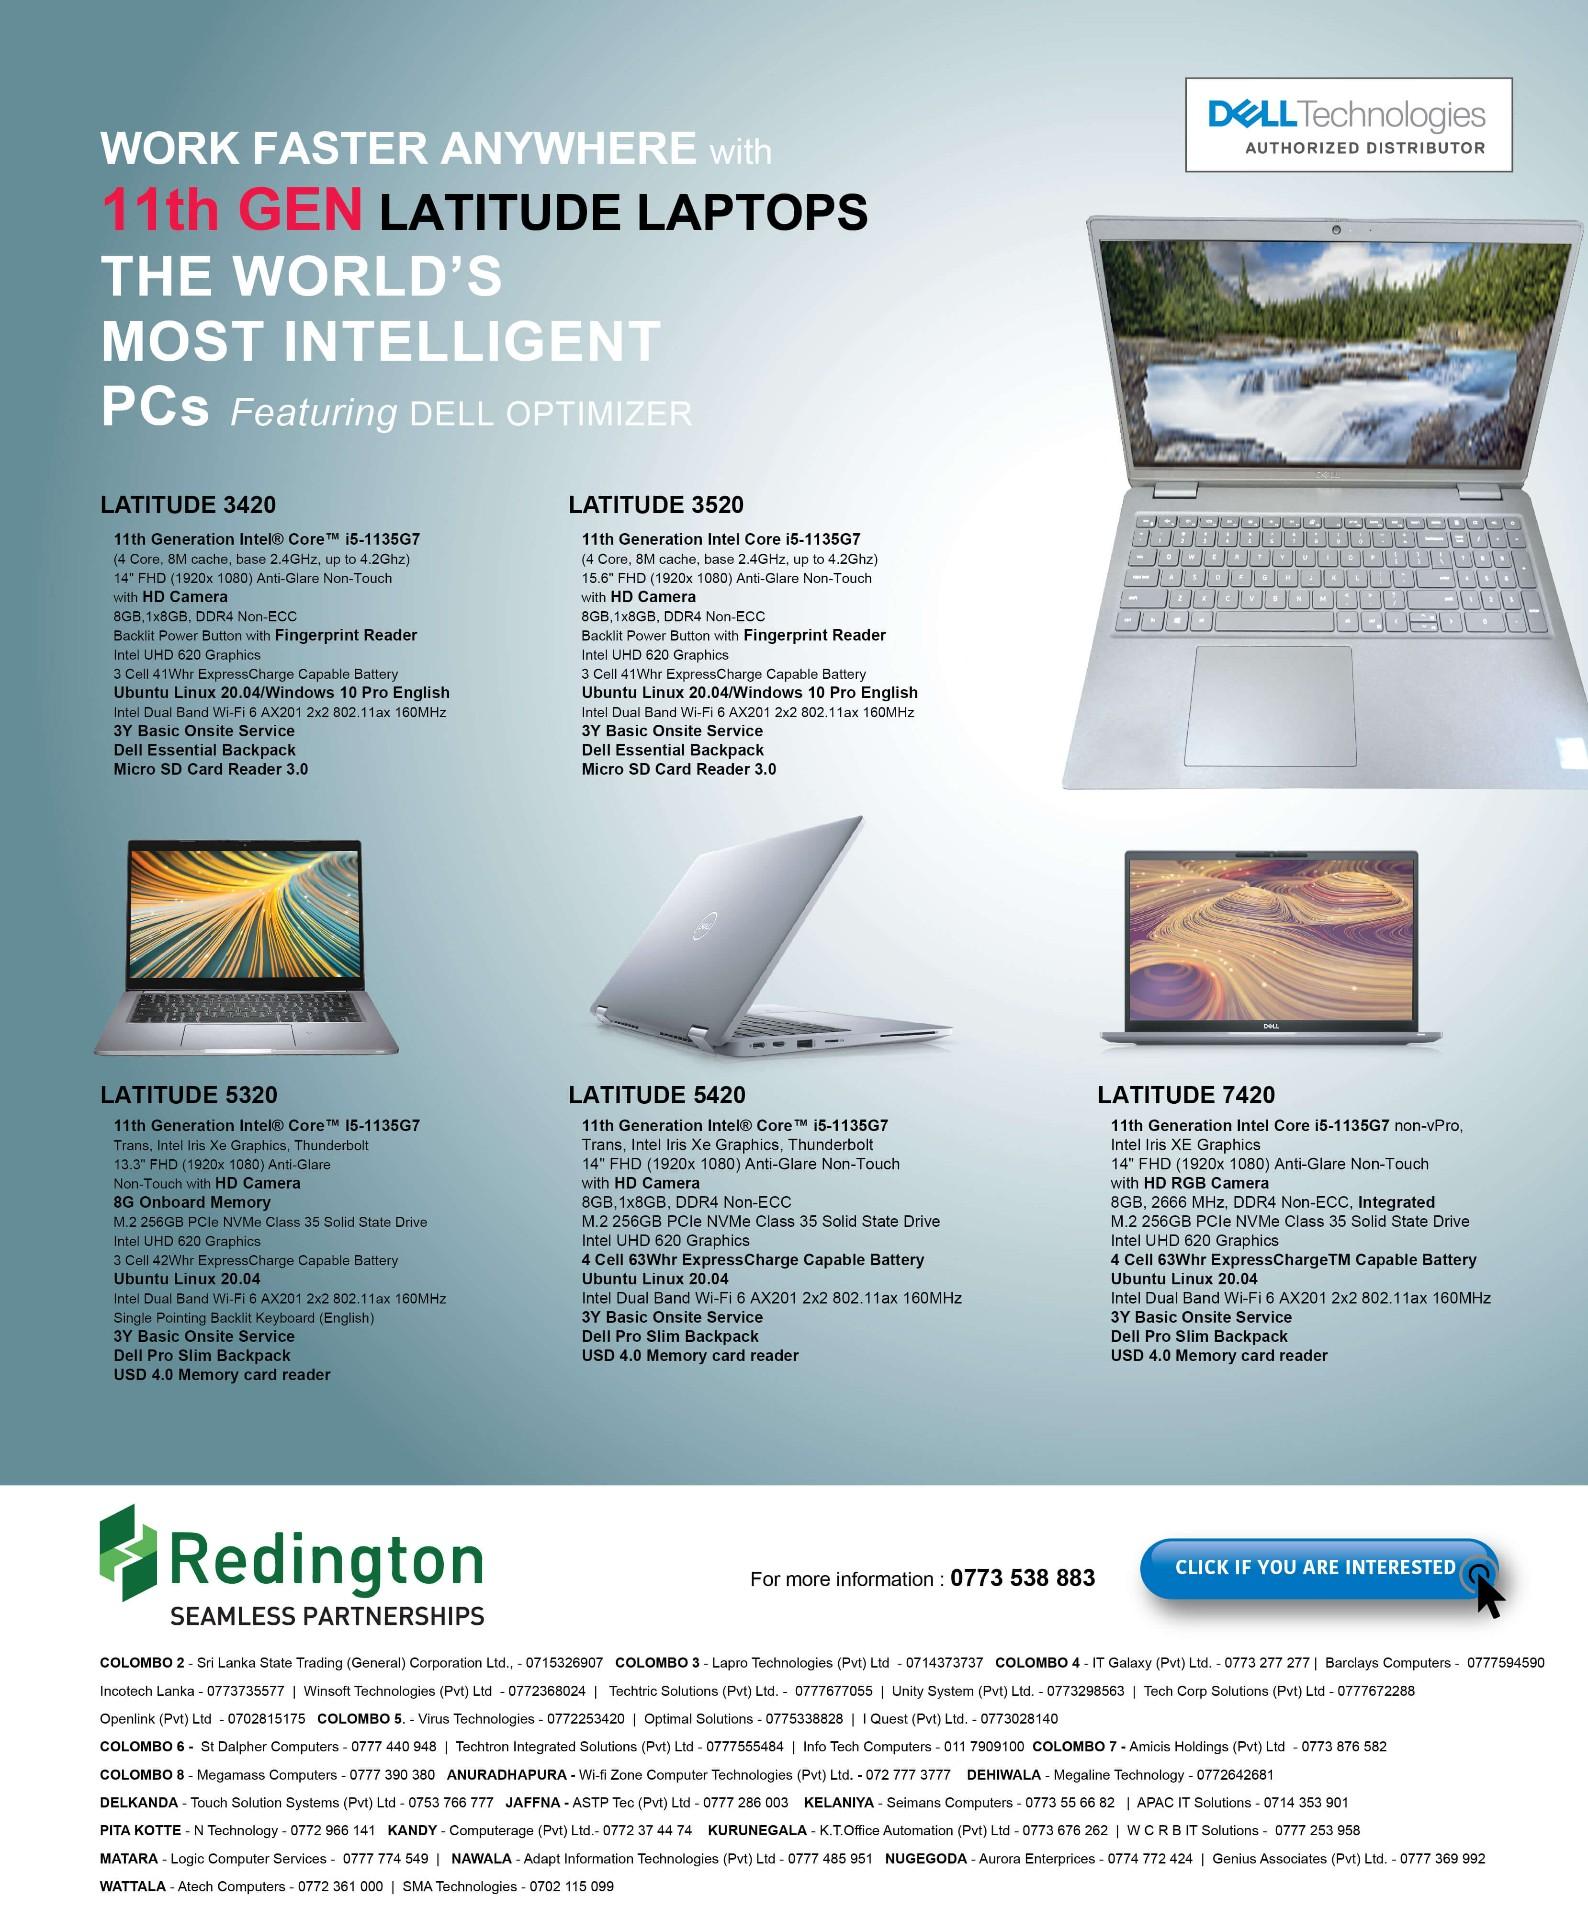 Dell Latitude 11th Gen Laptop